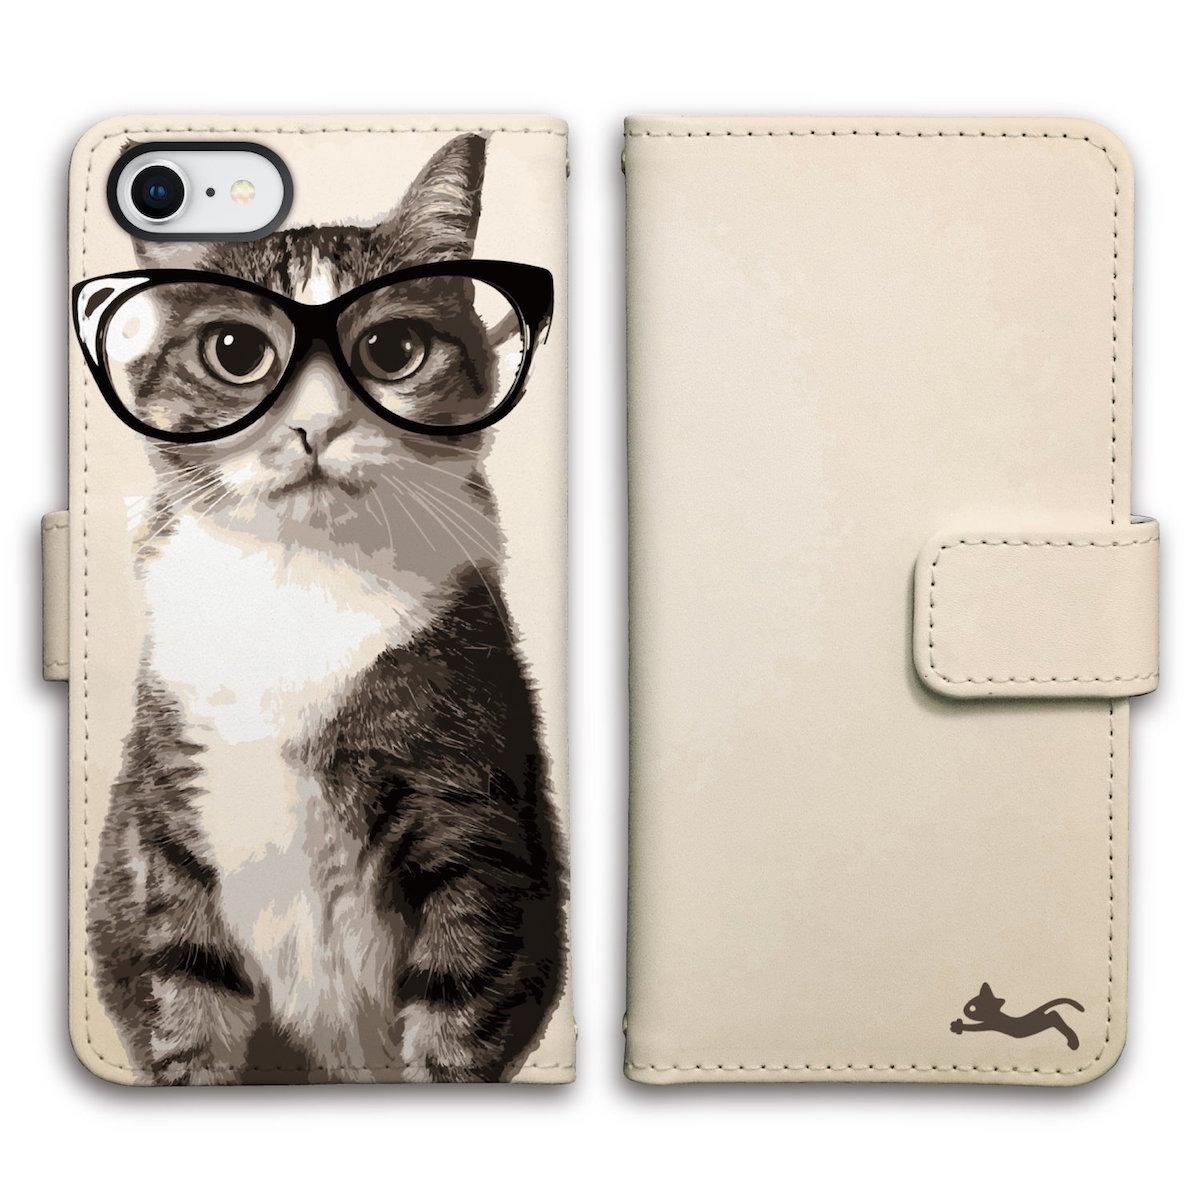 e8c5b78f37 楽天市場】iPhone XR XS Max iPhone8 ケース 手帳型 iPhone X iPhone7 ...